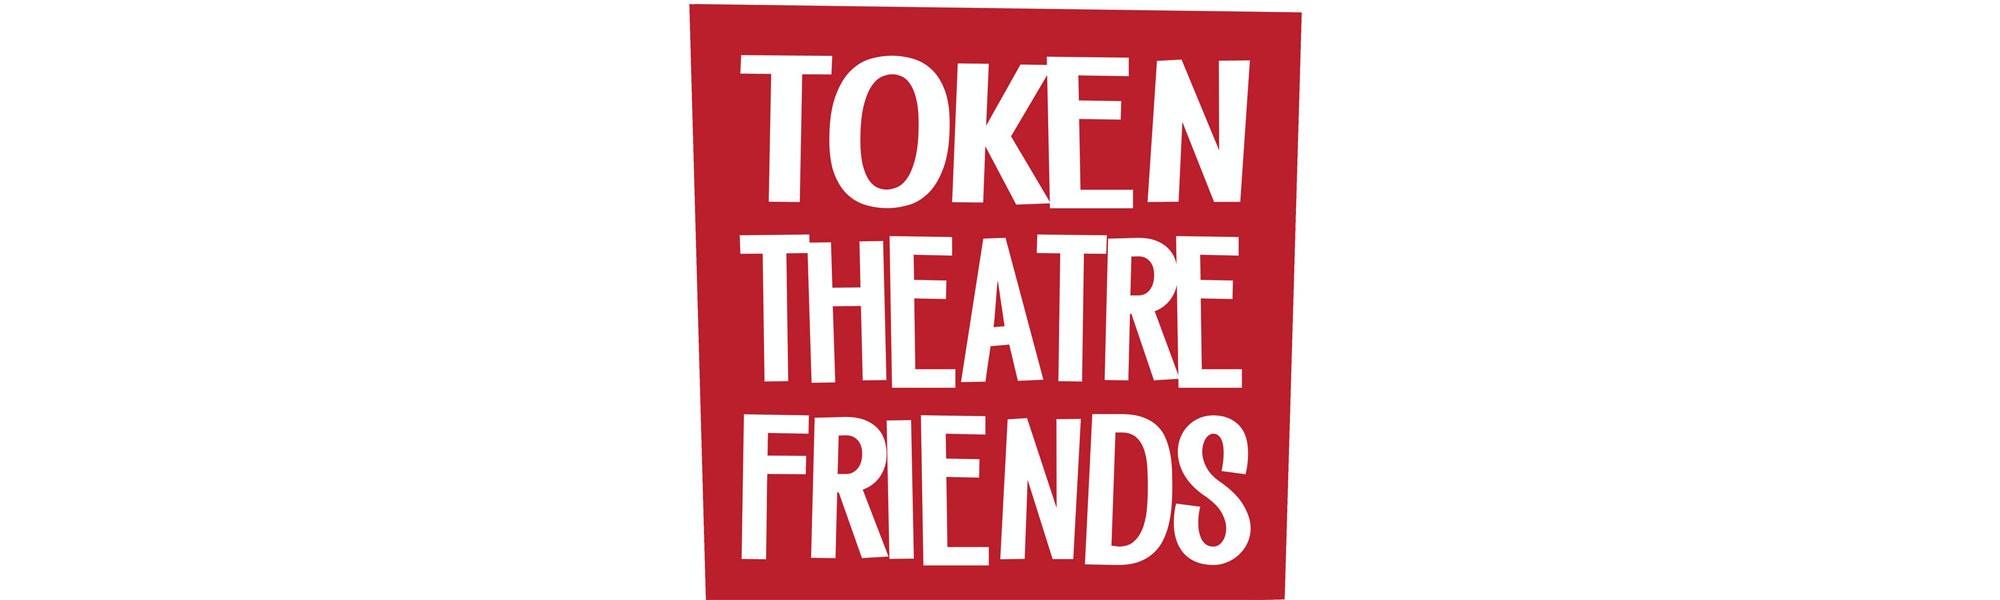 Token Theatre Friends